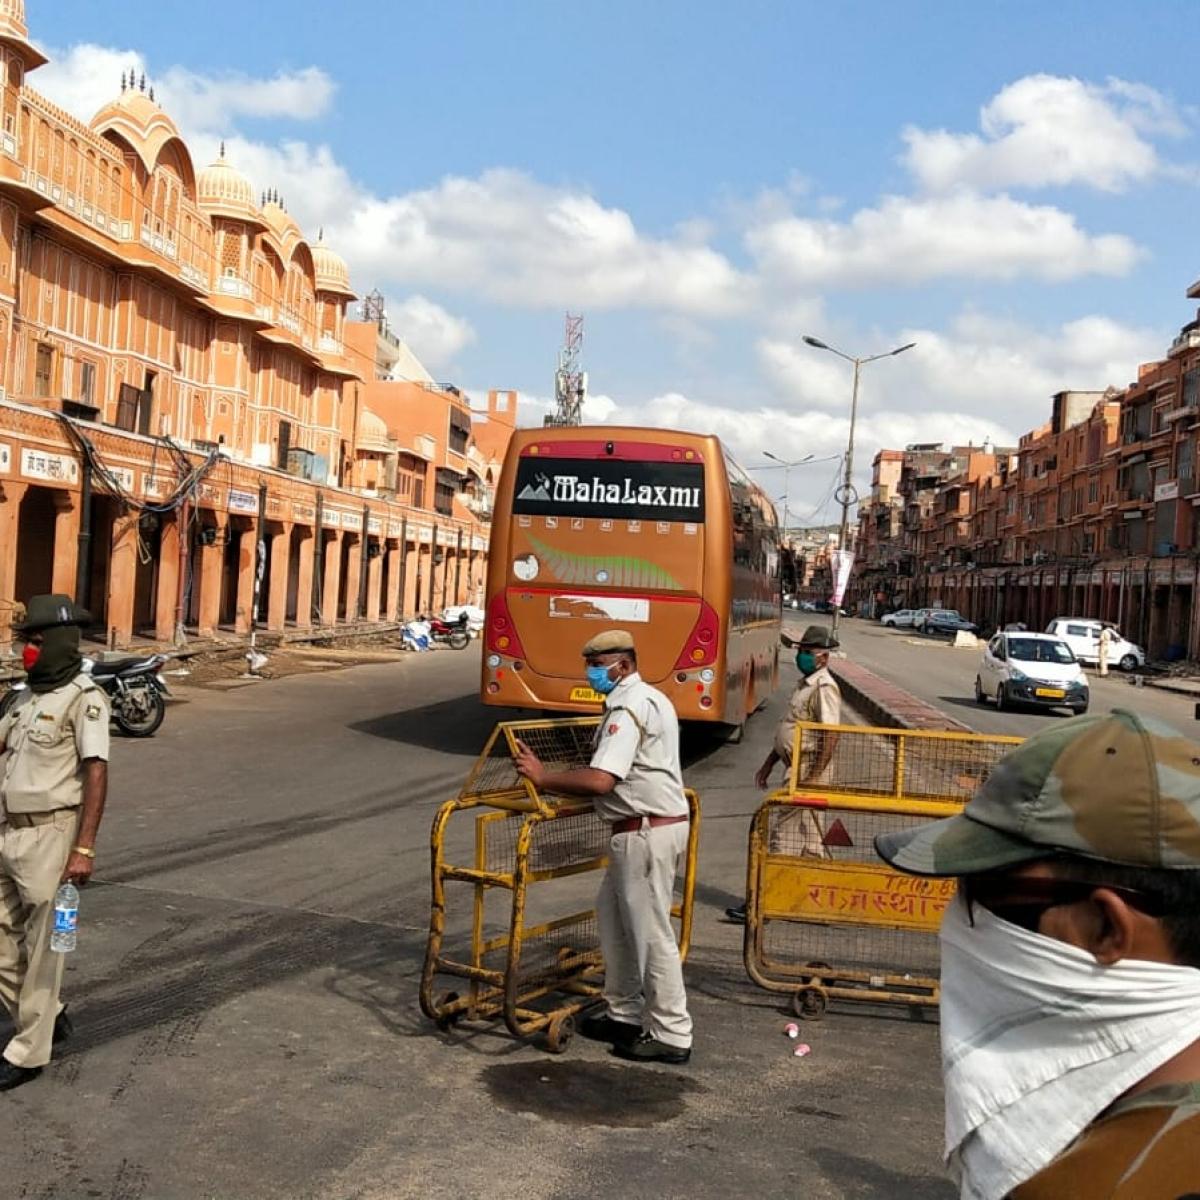 Coronavirus in Rajasthan: Curfew imposed in entire walled city areas of Jaipur